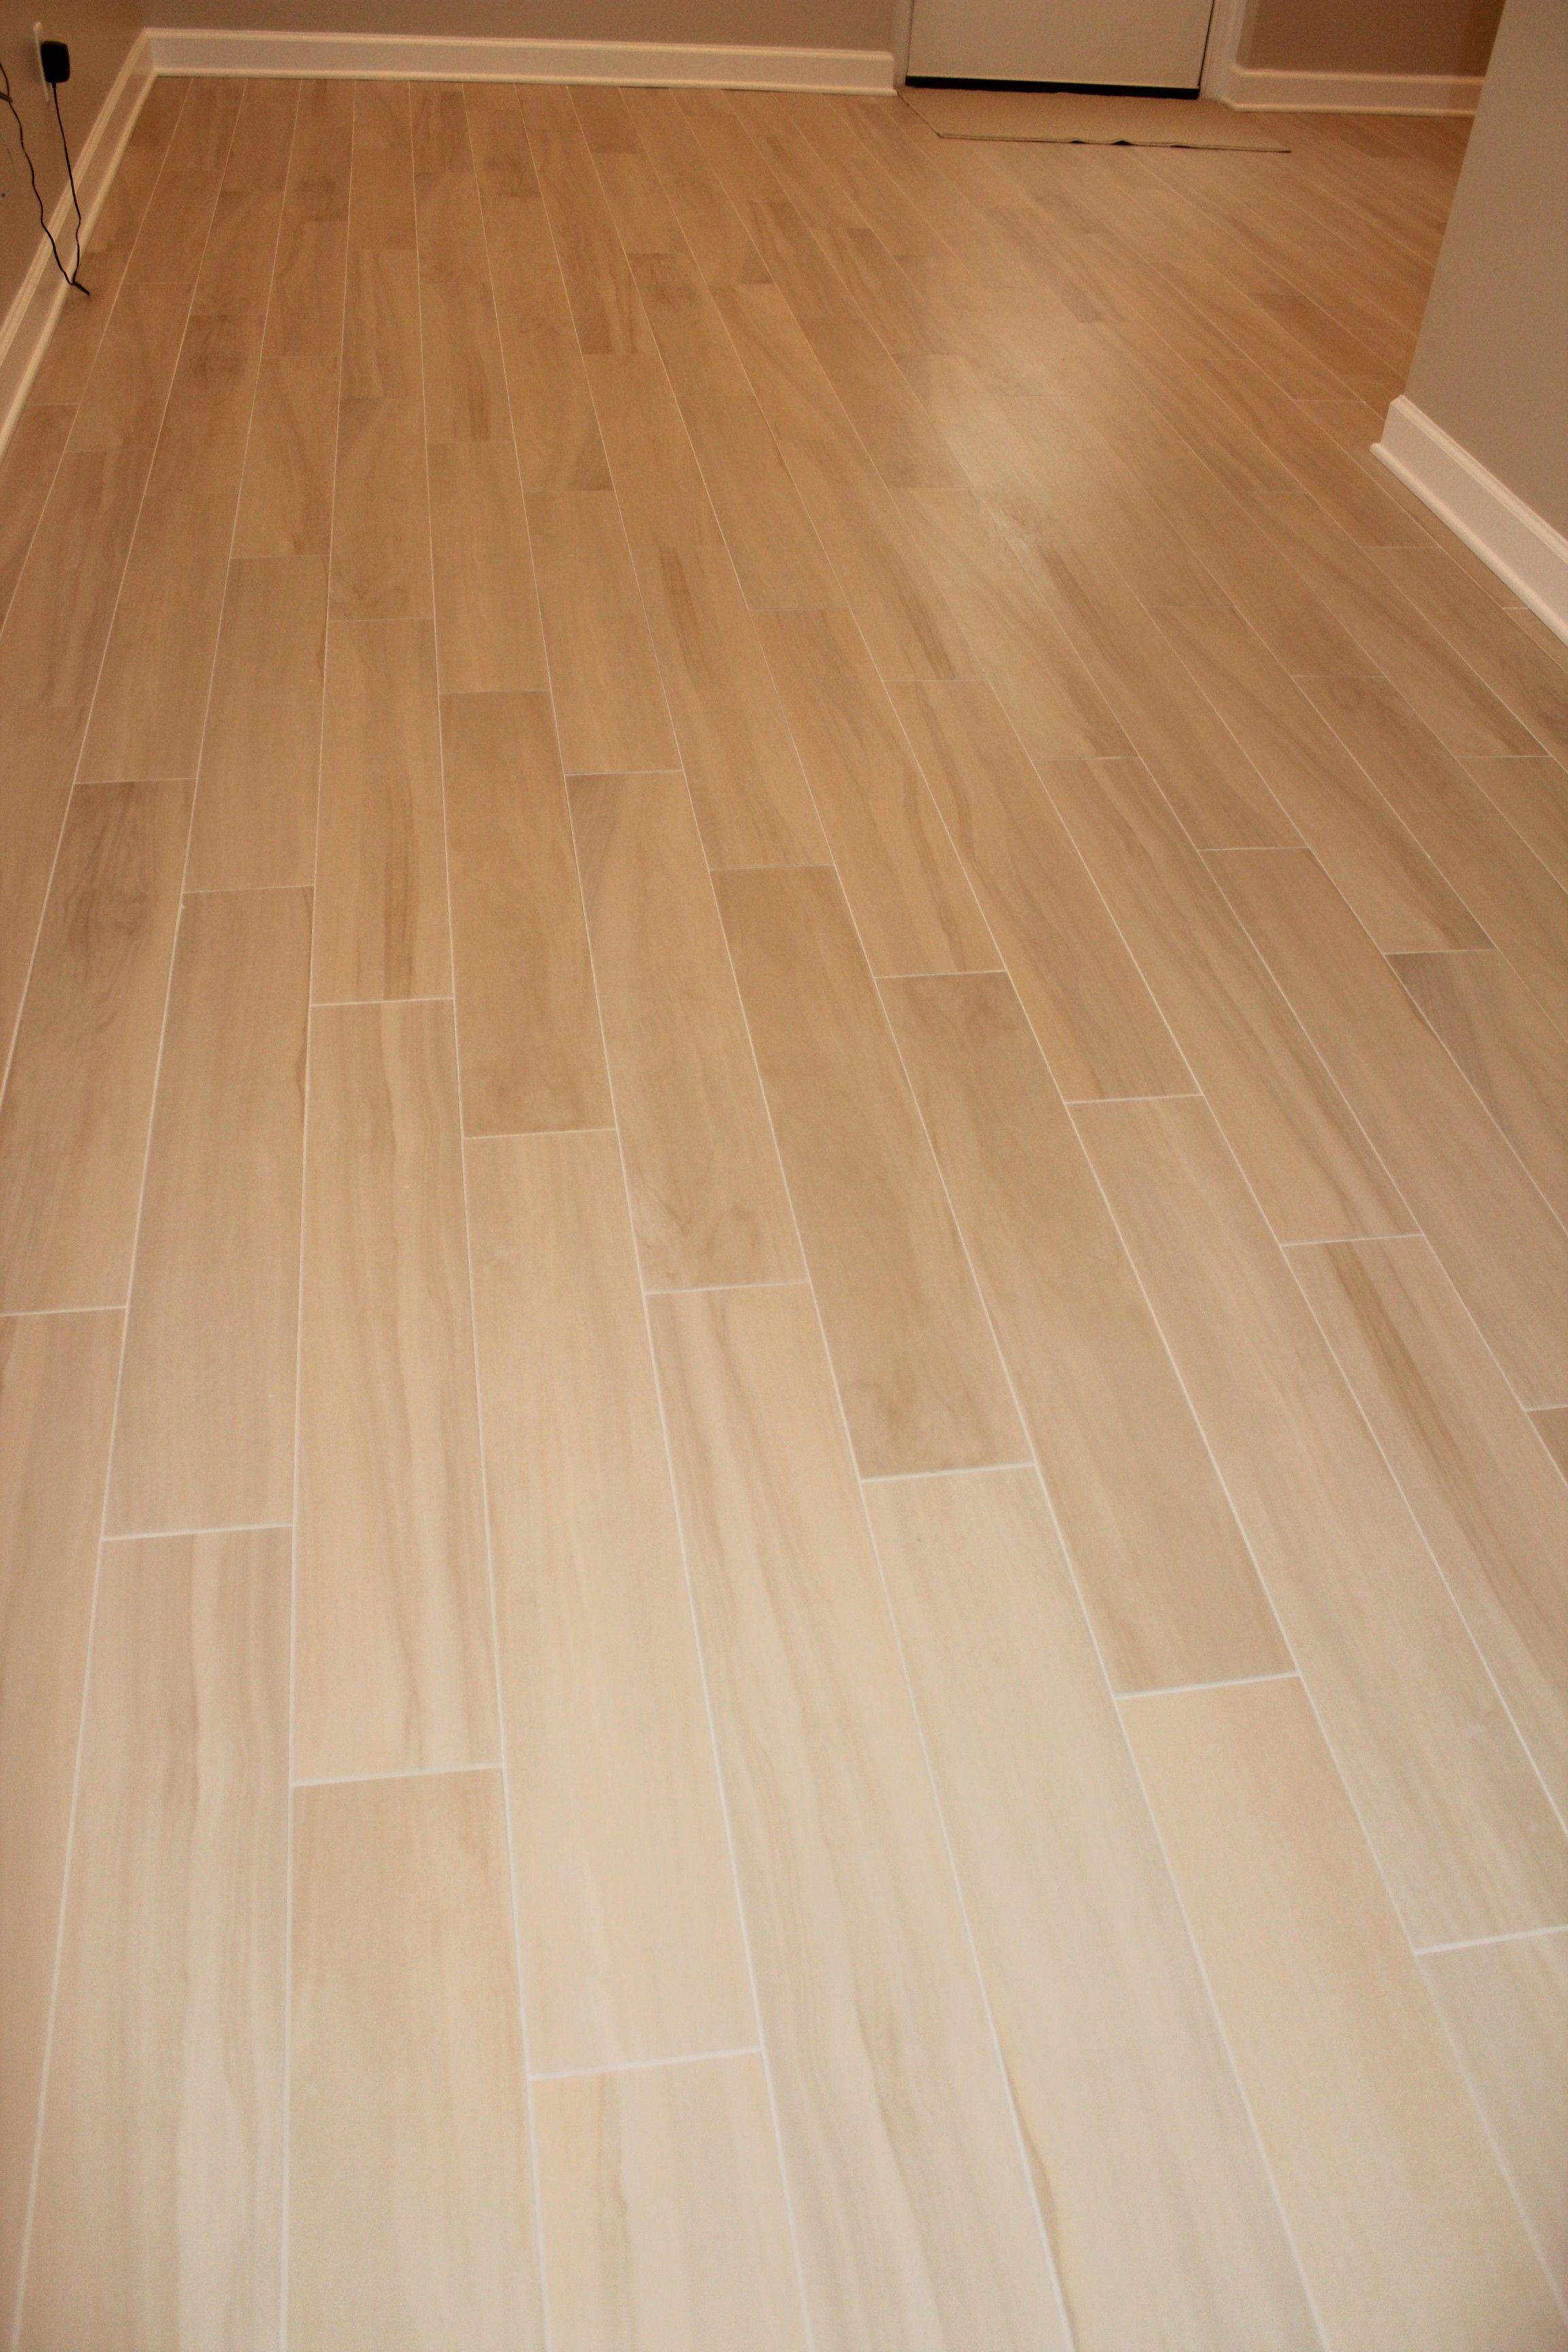 "Happy Floors Hickory 6"" x 36"" Honey wood look porcelain"